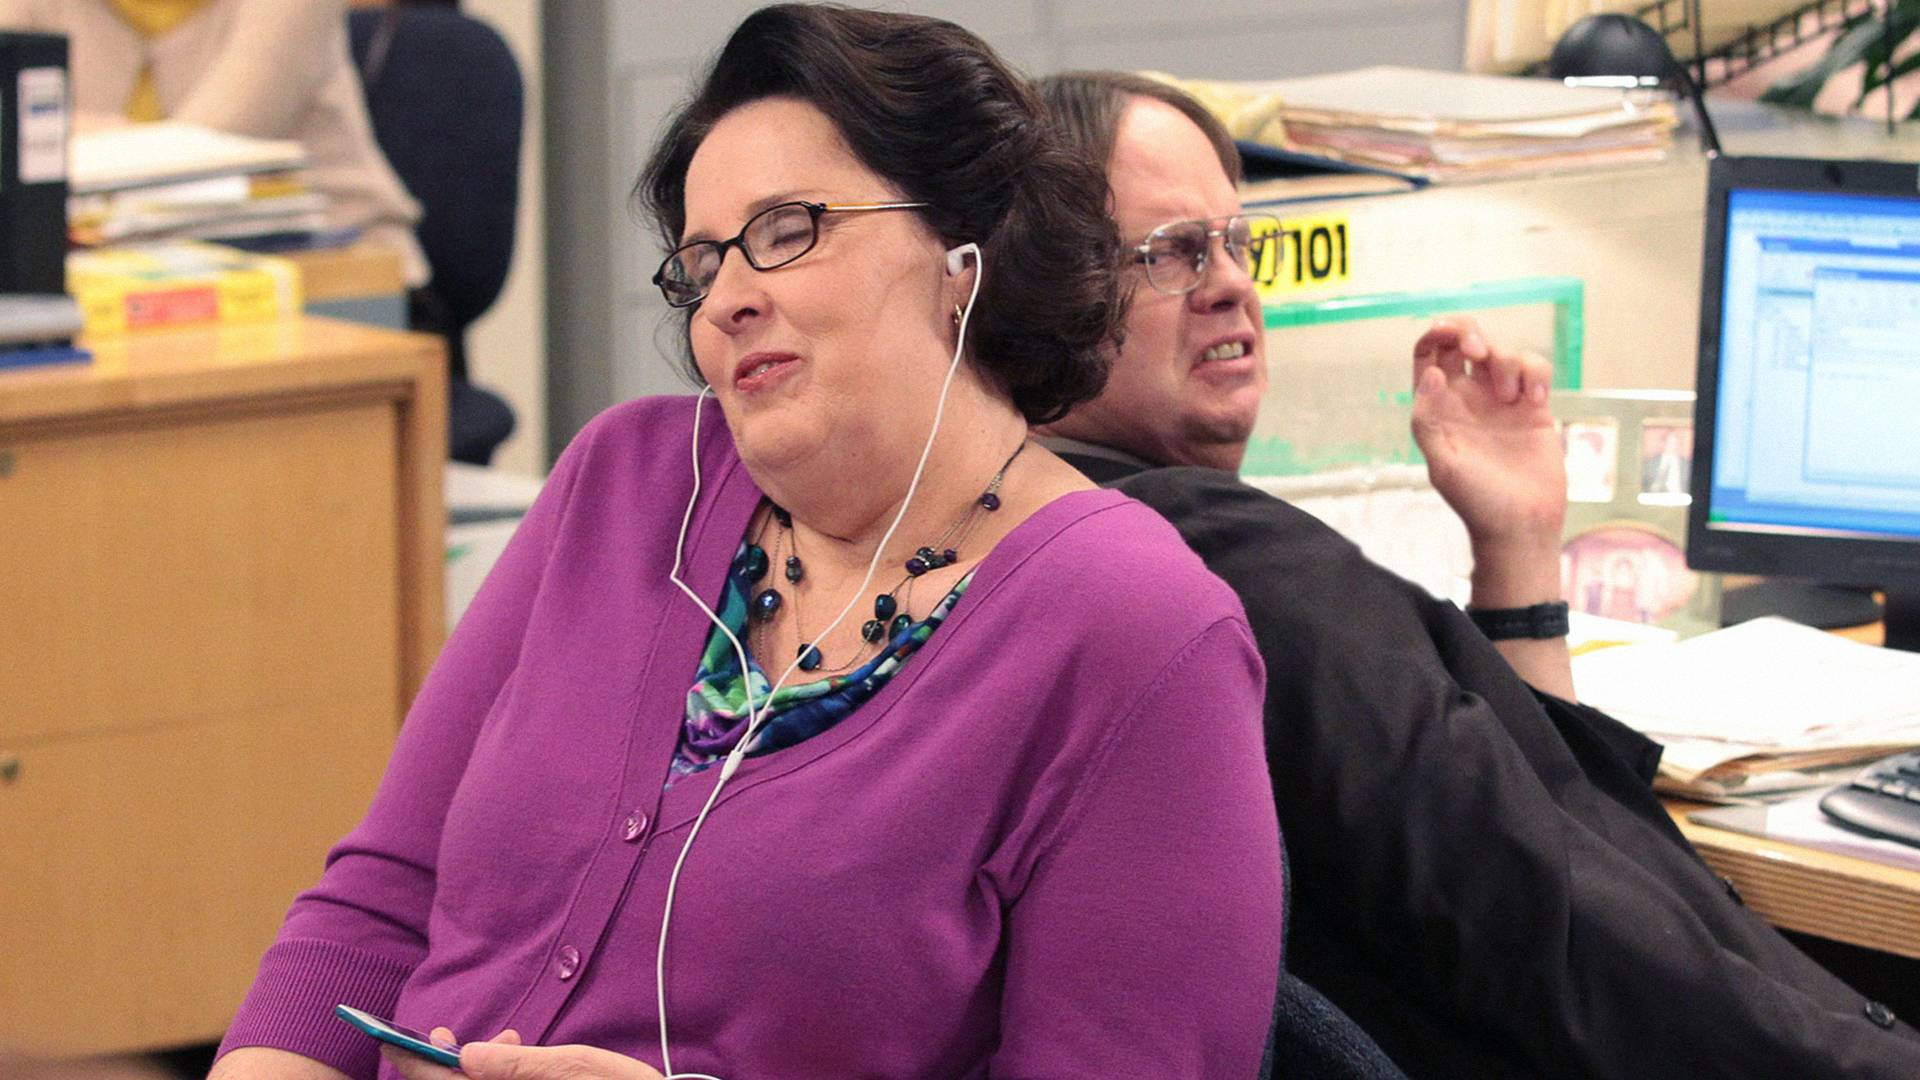 The Office Season 9 Episode 19